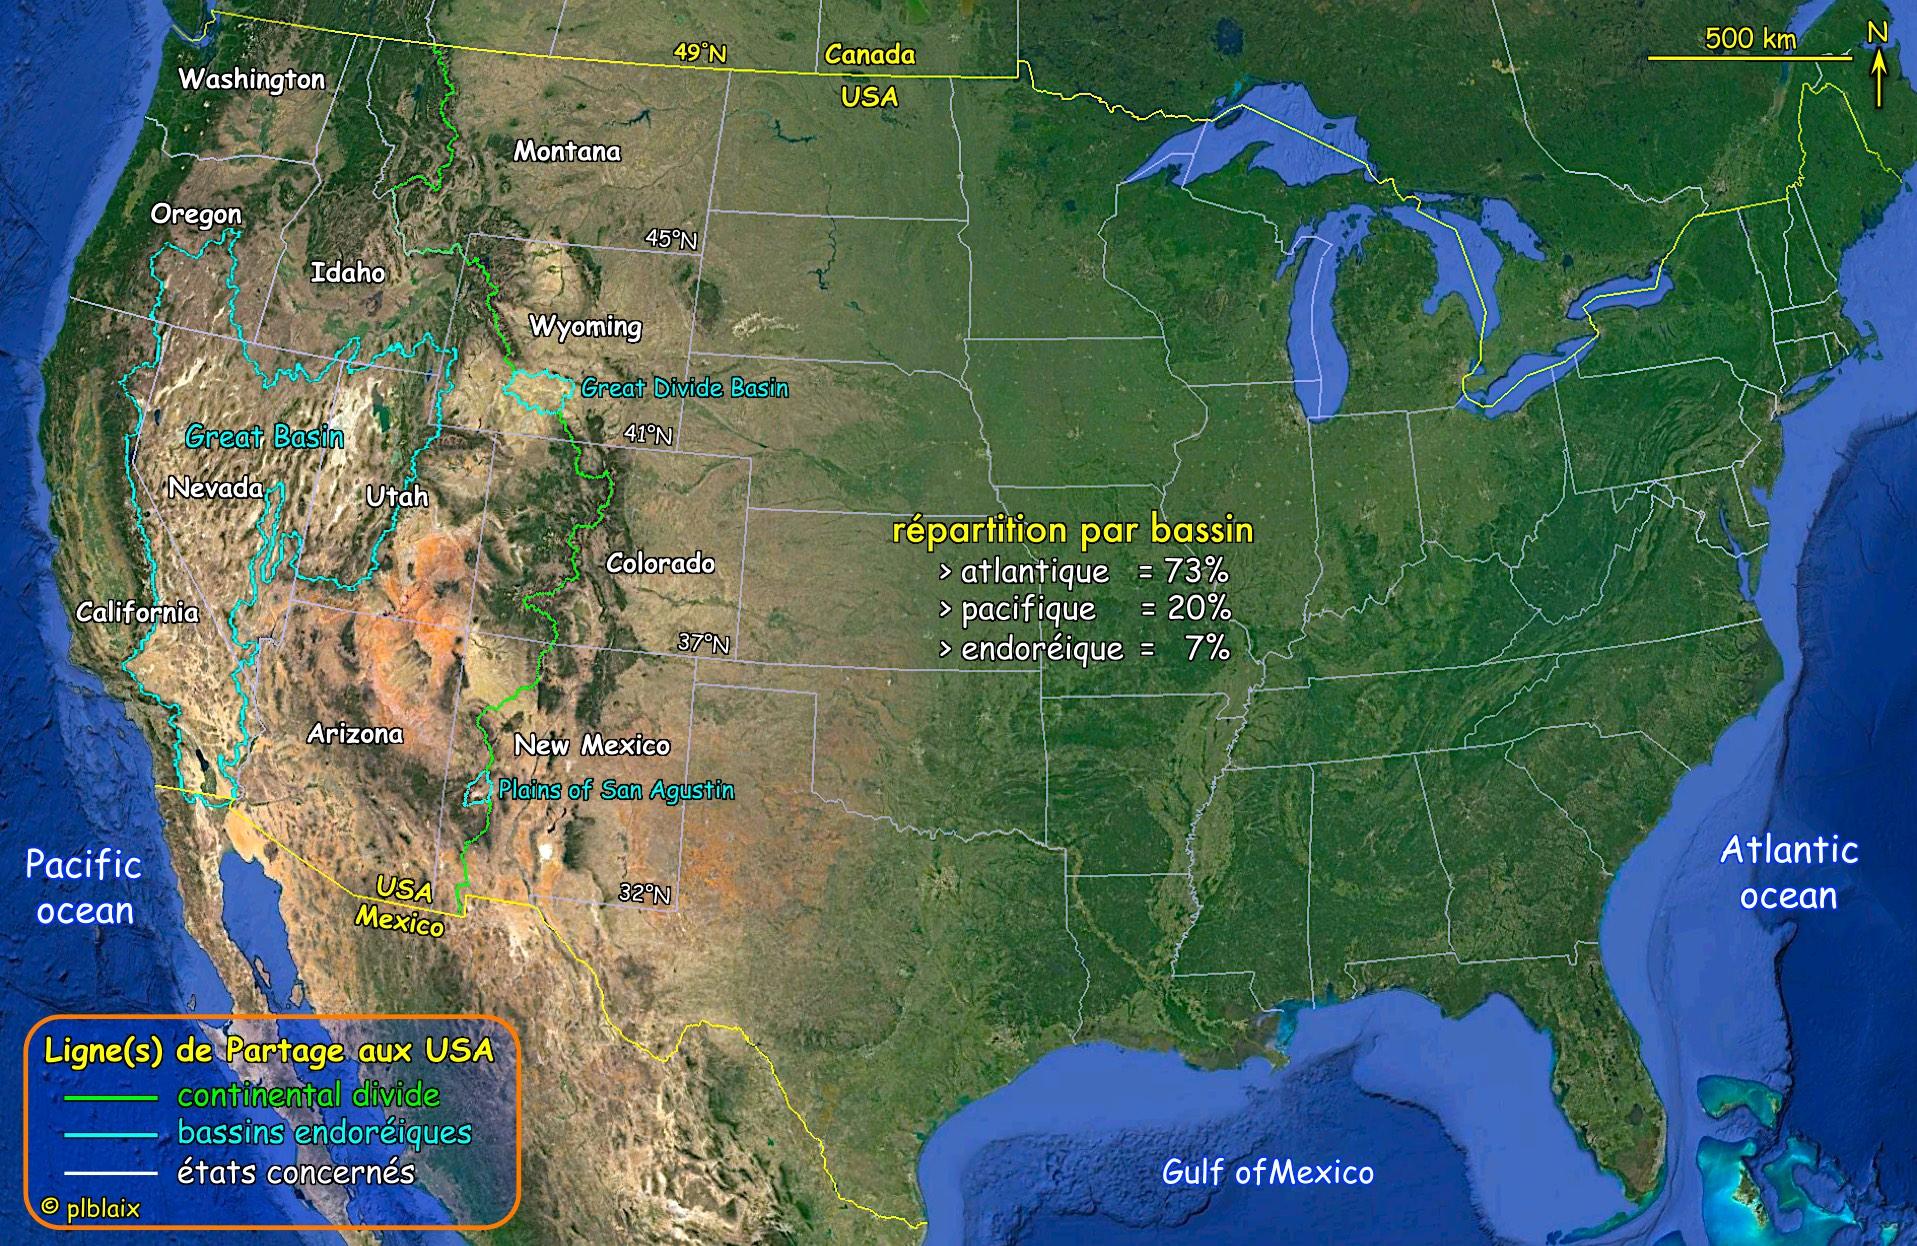 Continental Divide et bassins des USA